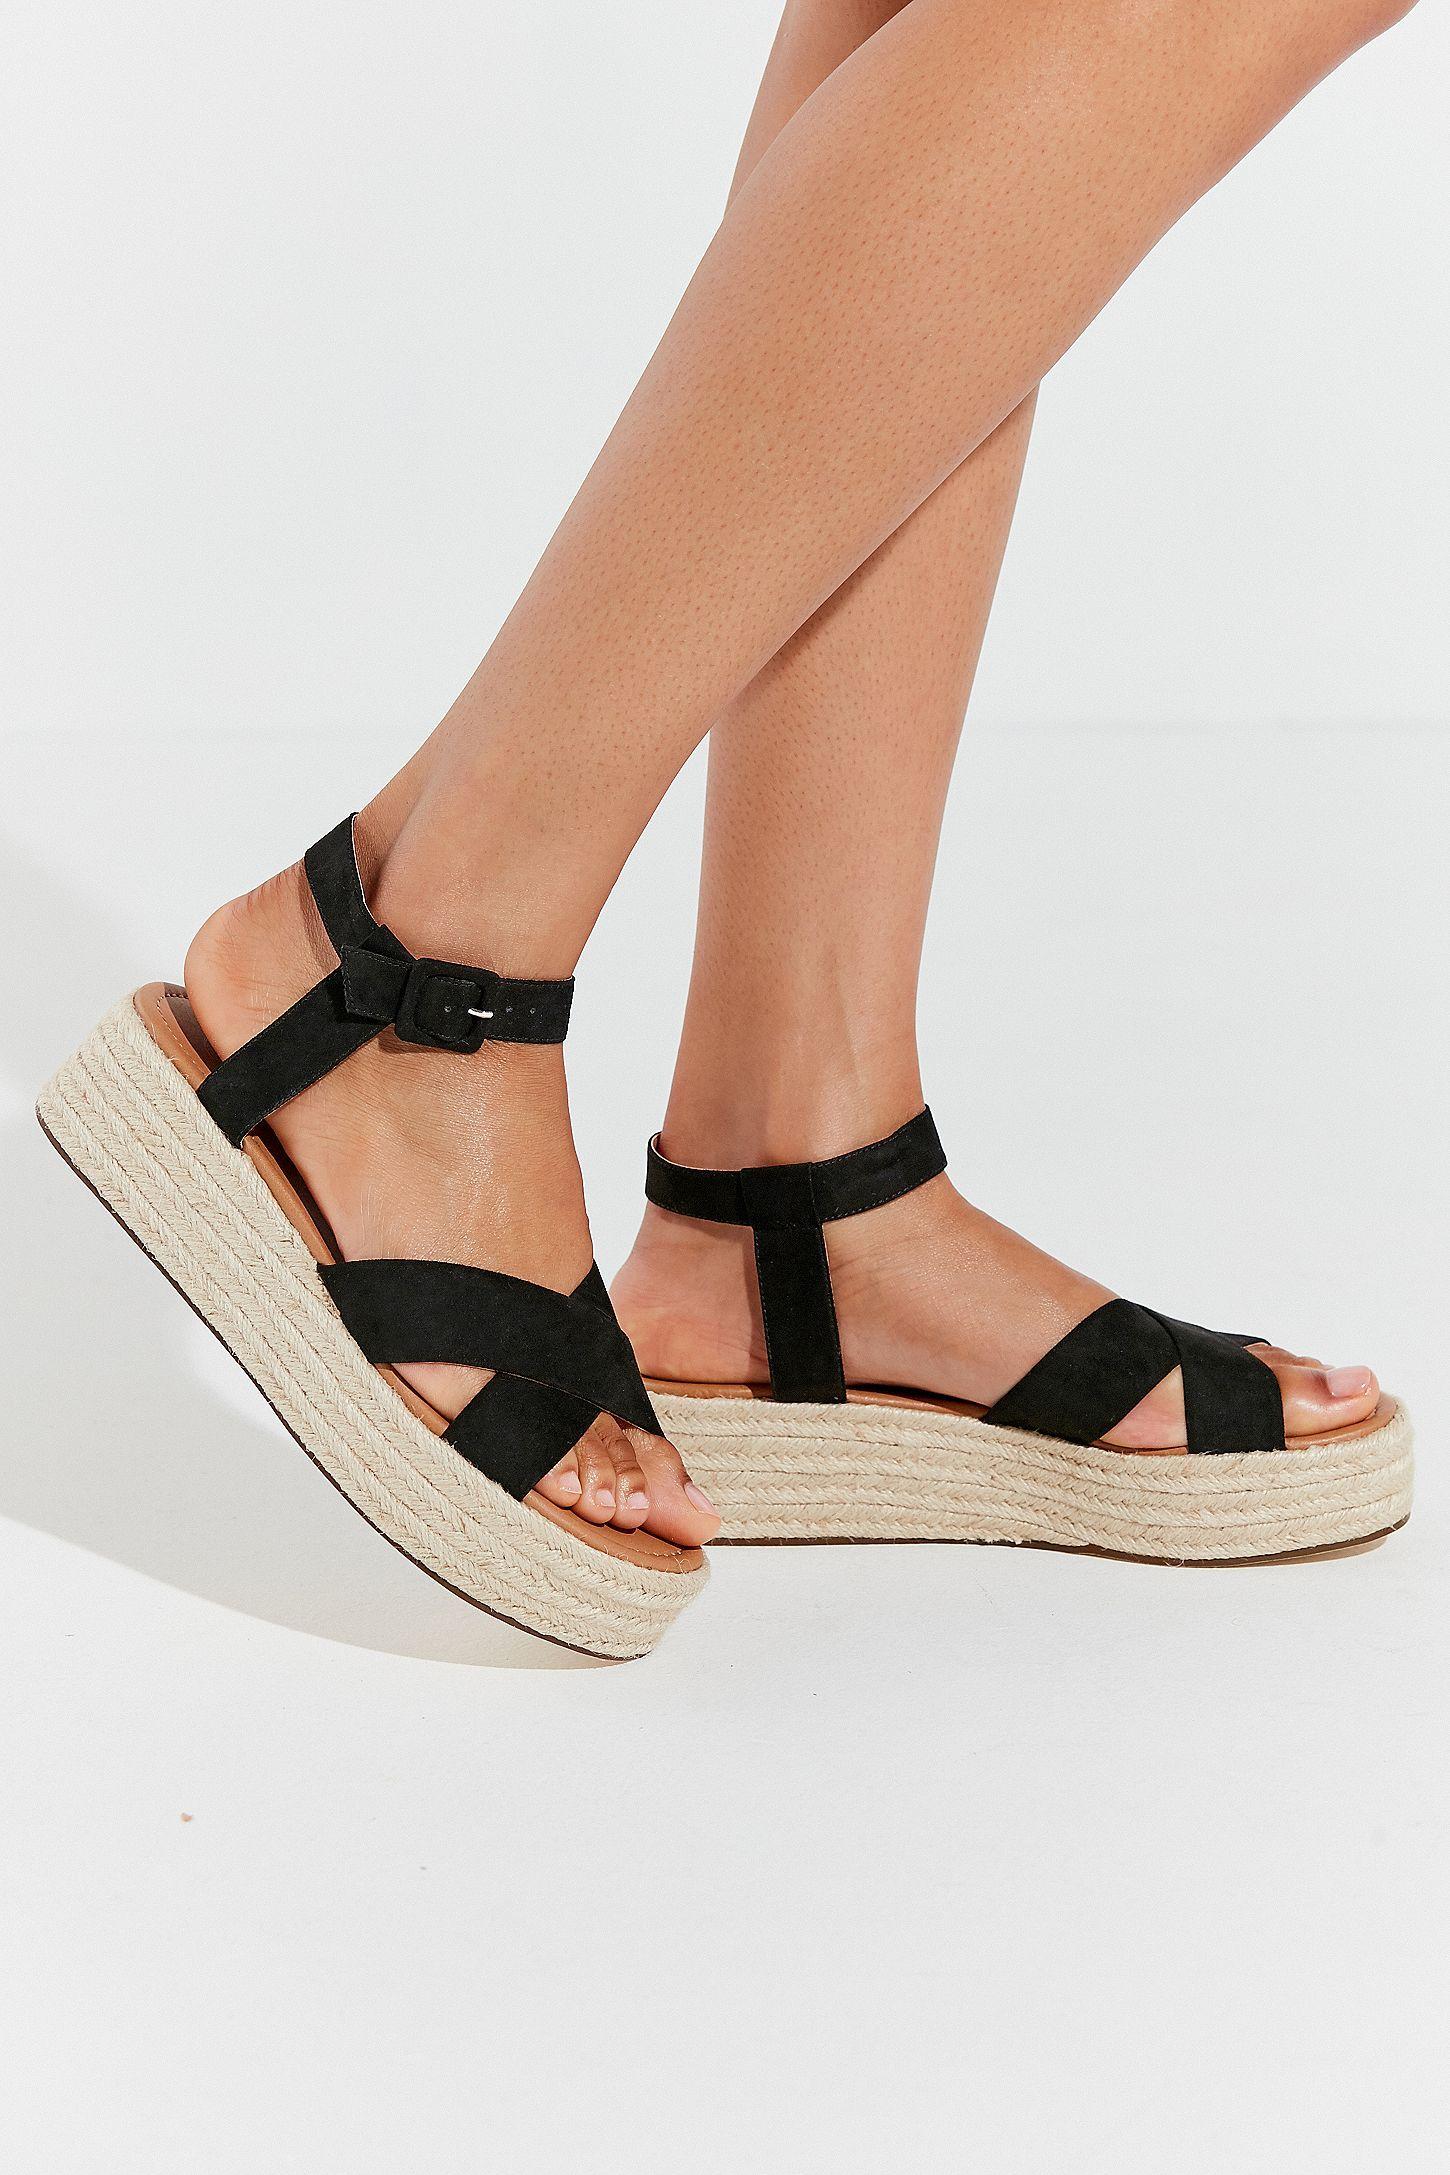 0f1116761a0c Cora Flatform Espadrille Sandal